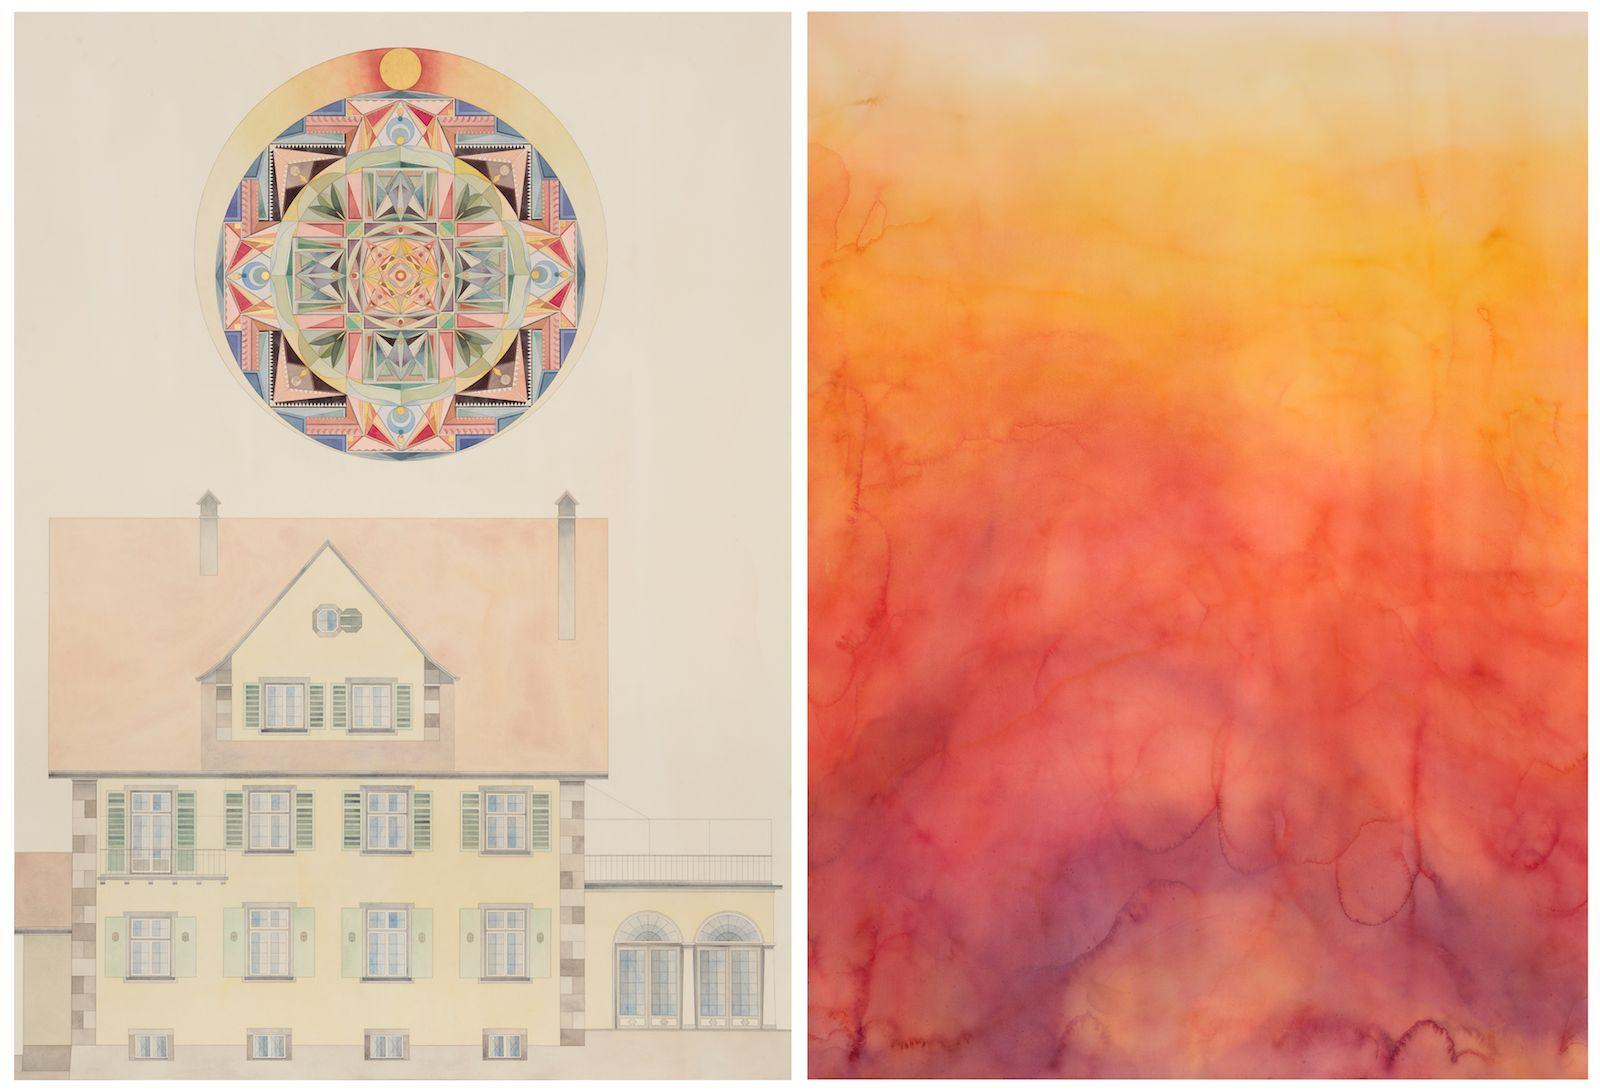 Das Haus des C.G Jungs mit Mandala II / Der Traum IV, 2013, watercolour and gold-leaf on paper, 196 x 144 cm / 196 x 144 cm